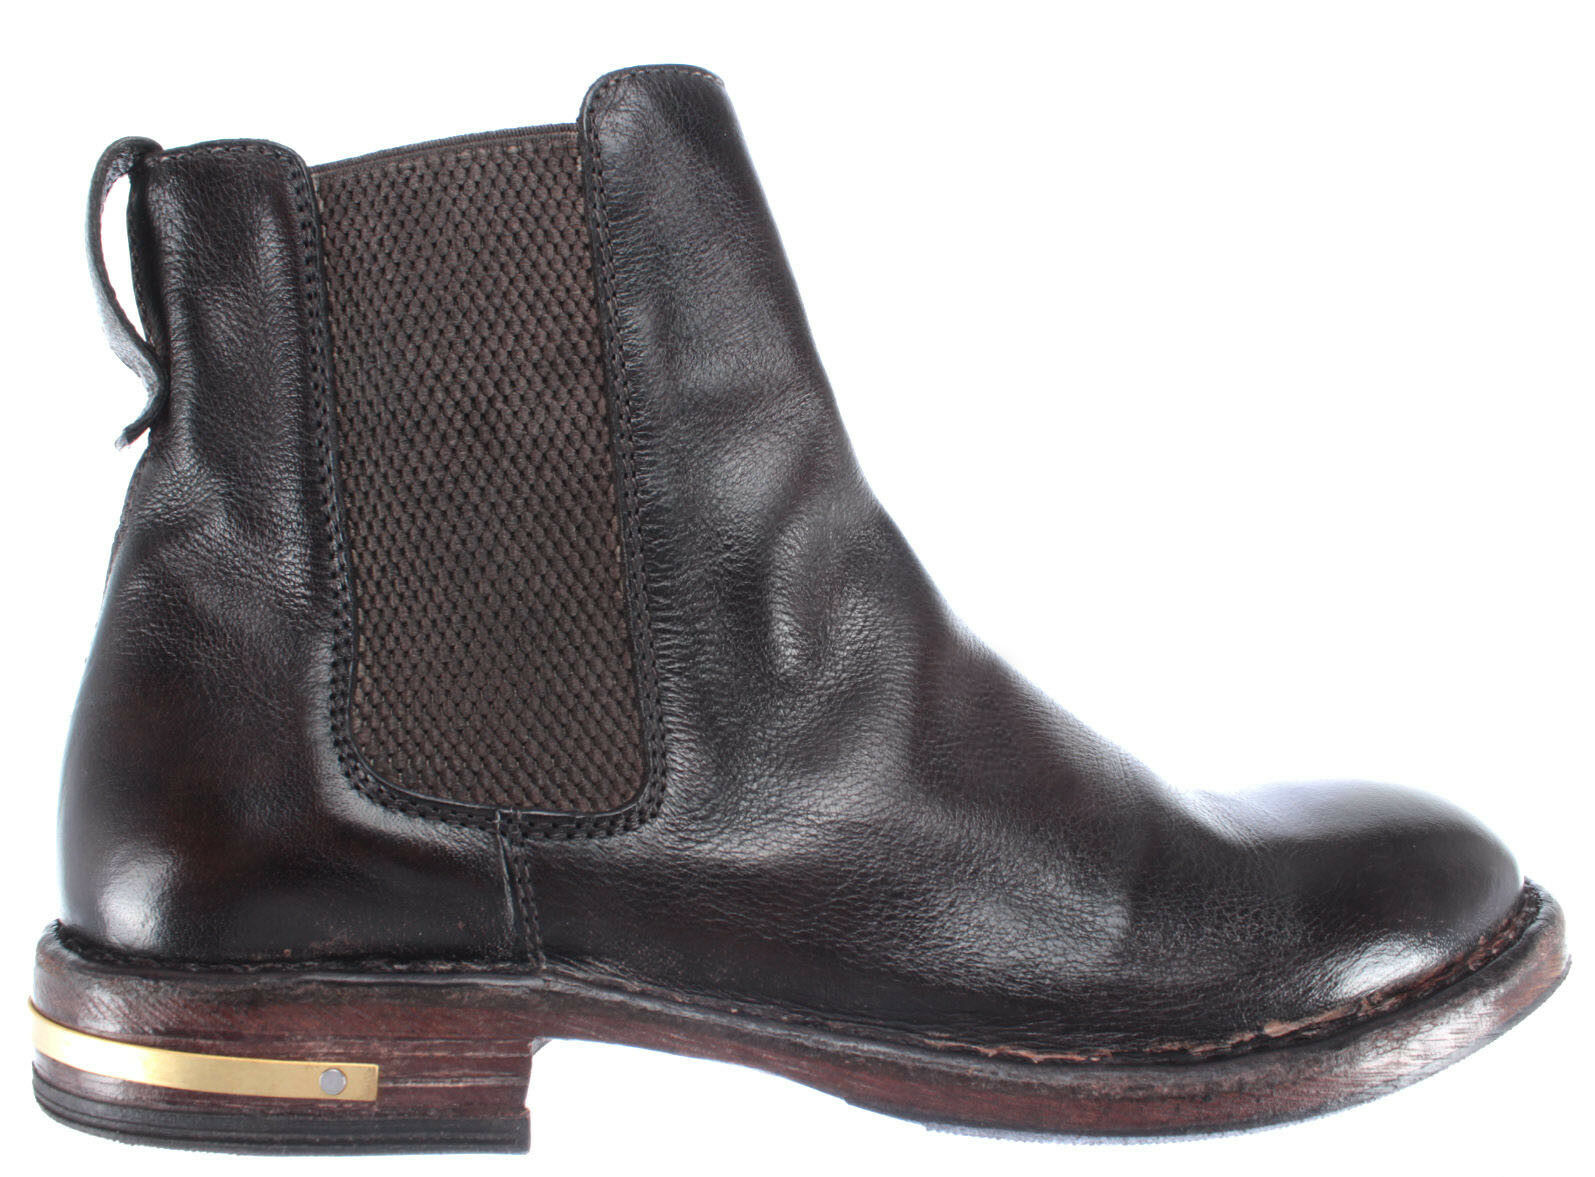 Zapatos Mujer Botines MOMA 83704-R2 Pelle Piel Marron Oscuro Vintage Made Italy